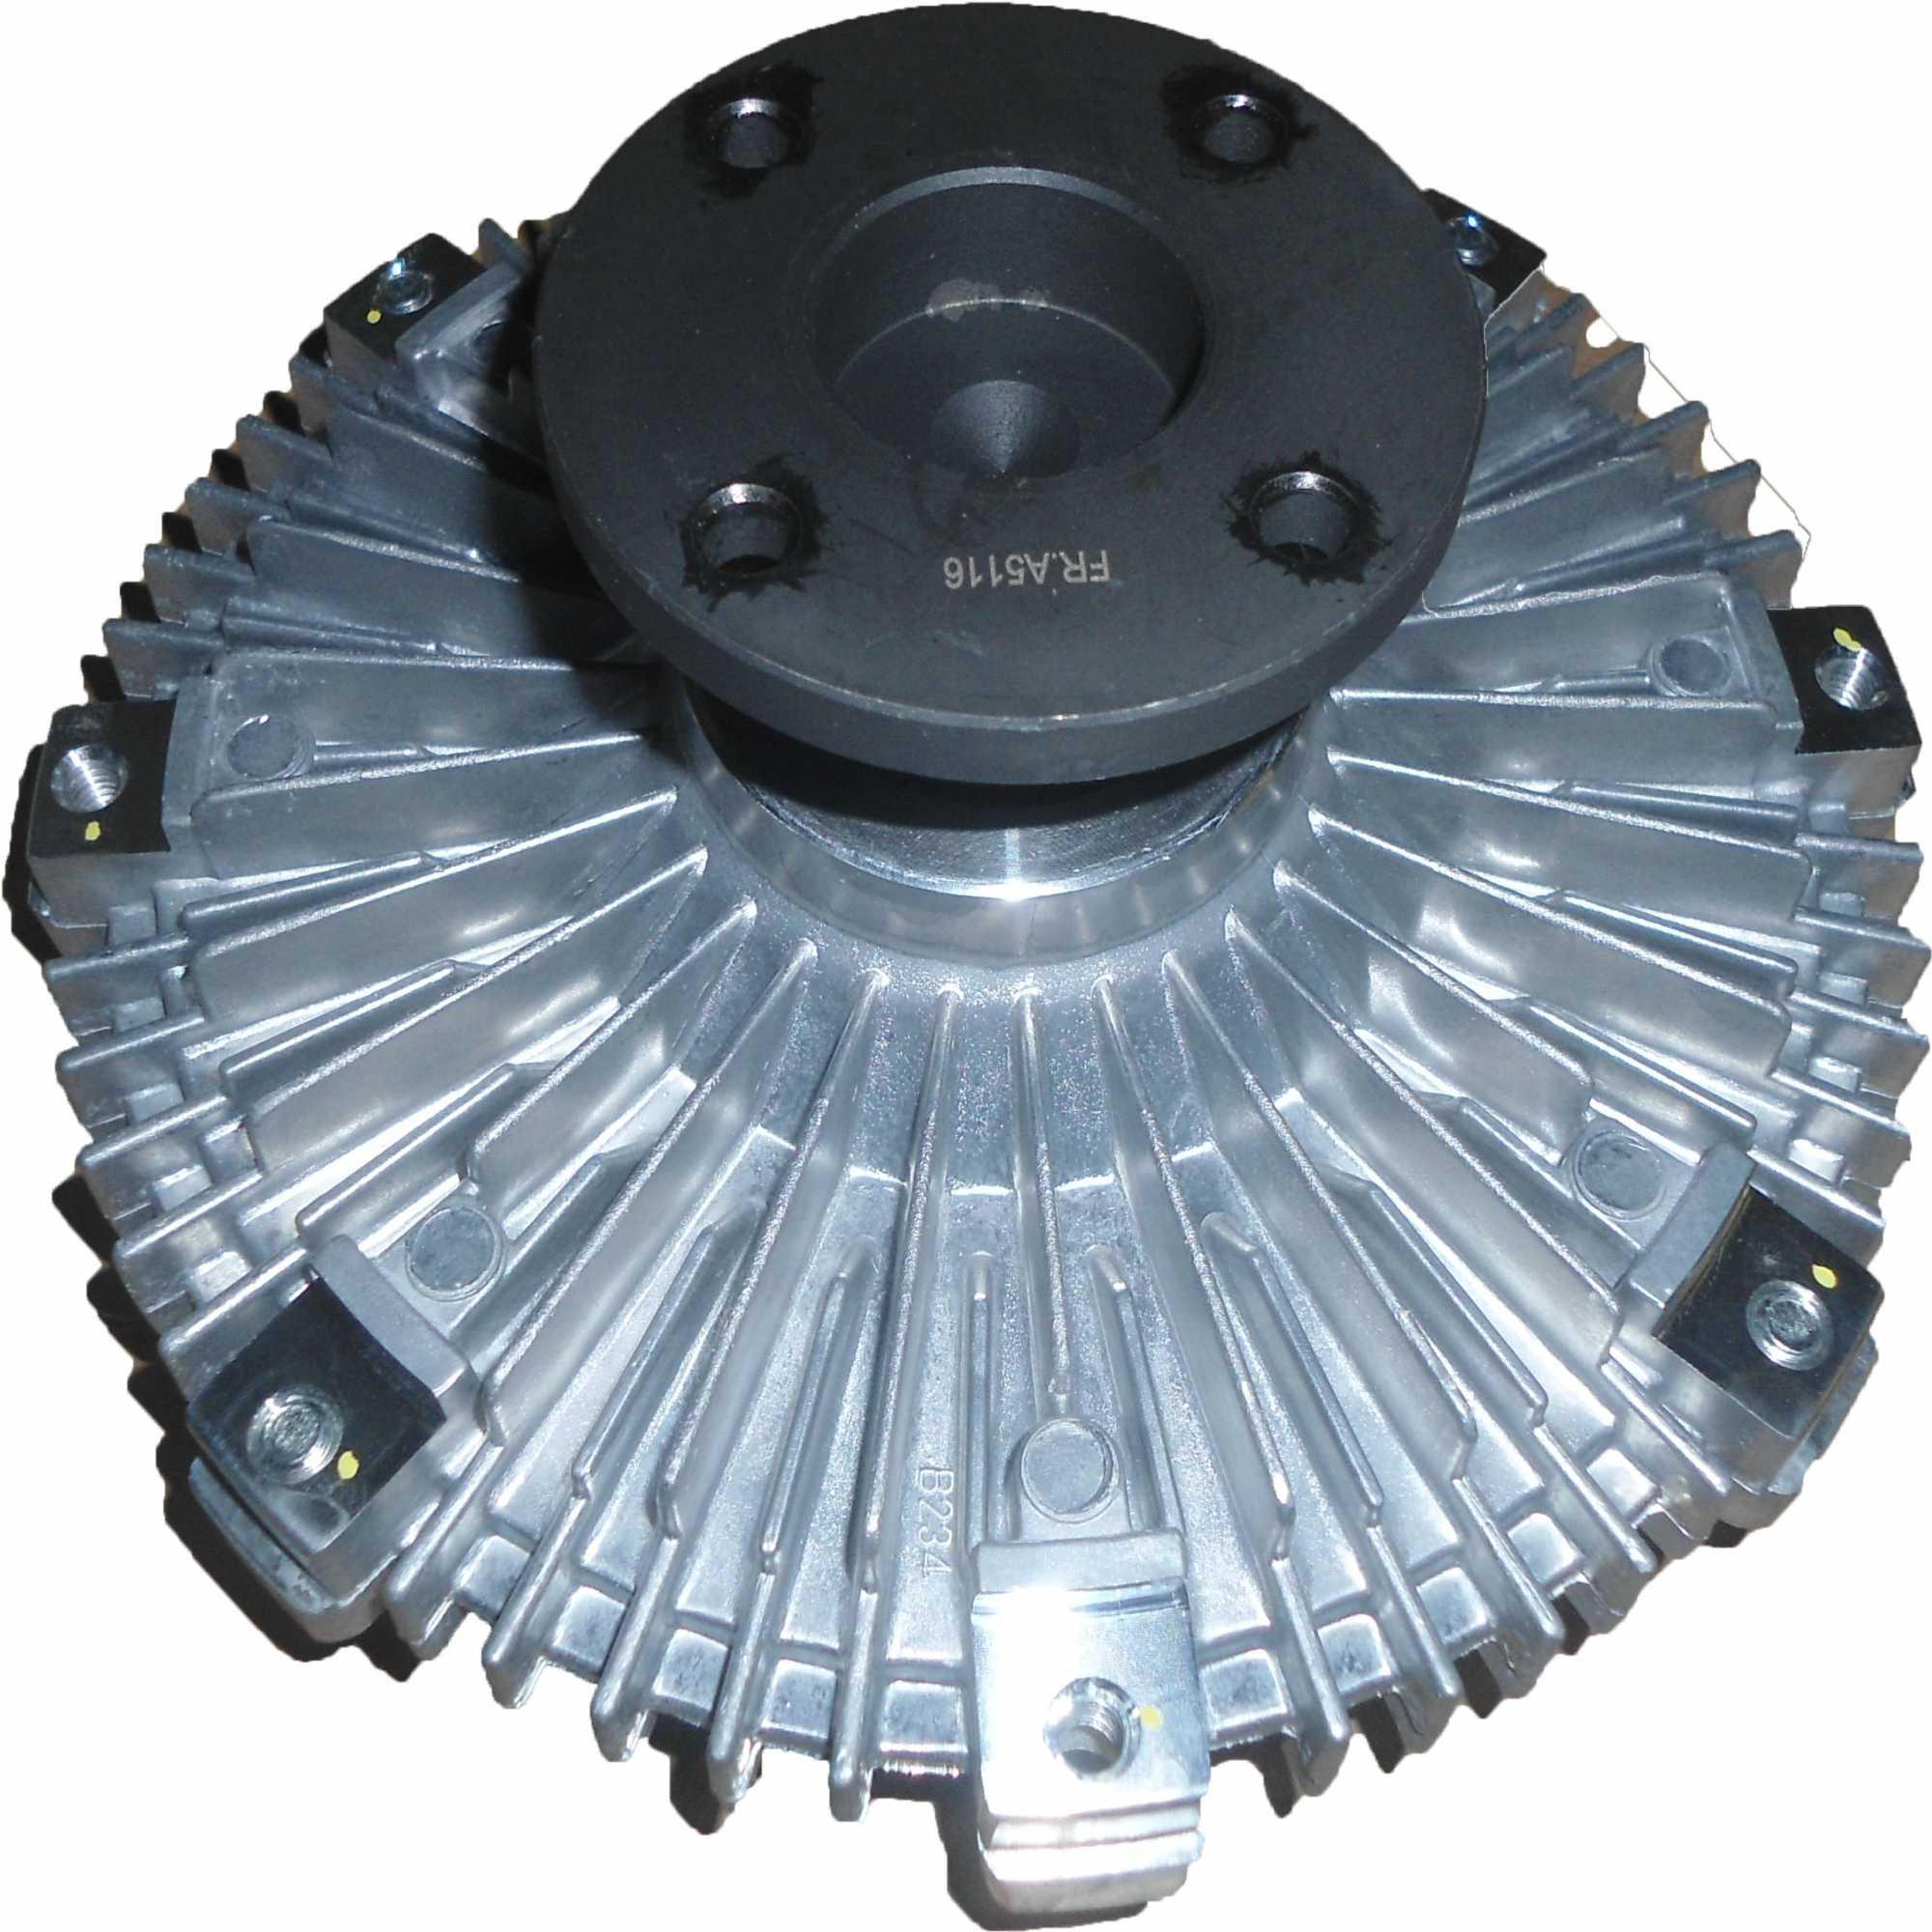 Embreagem Viscosa - Nissan Frontier 2.5 Diesel 07>12 Oem-21082Eb30A/N01He304/210